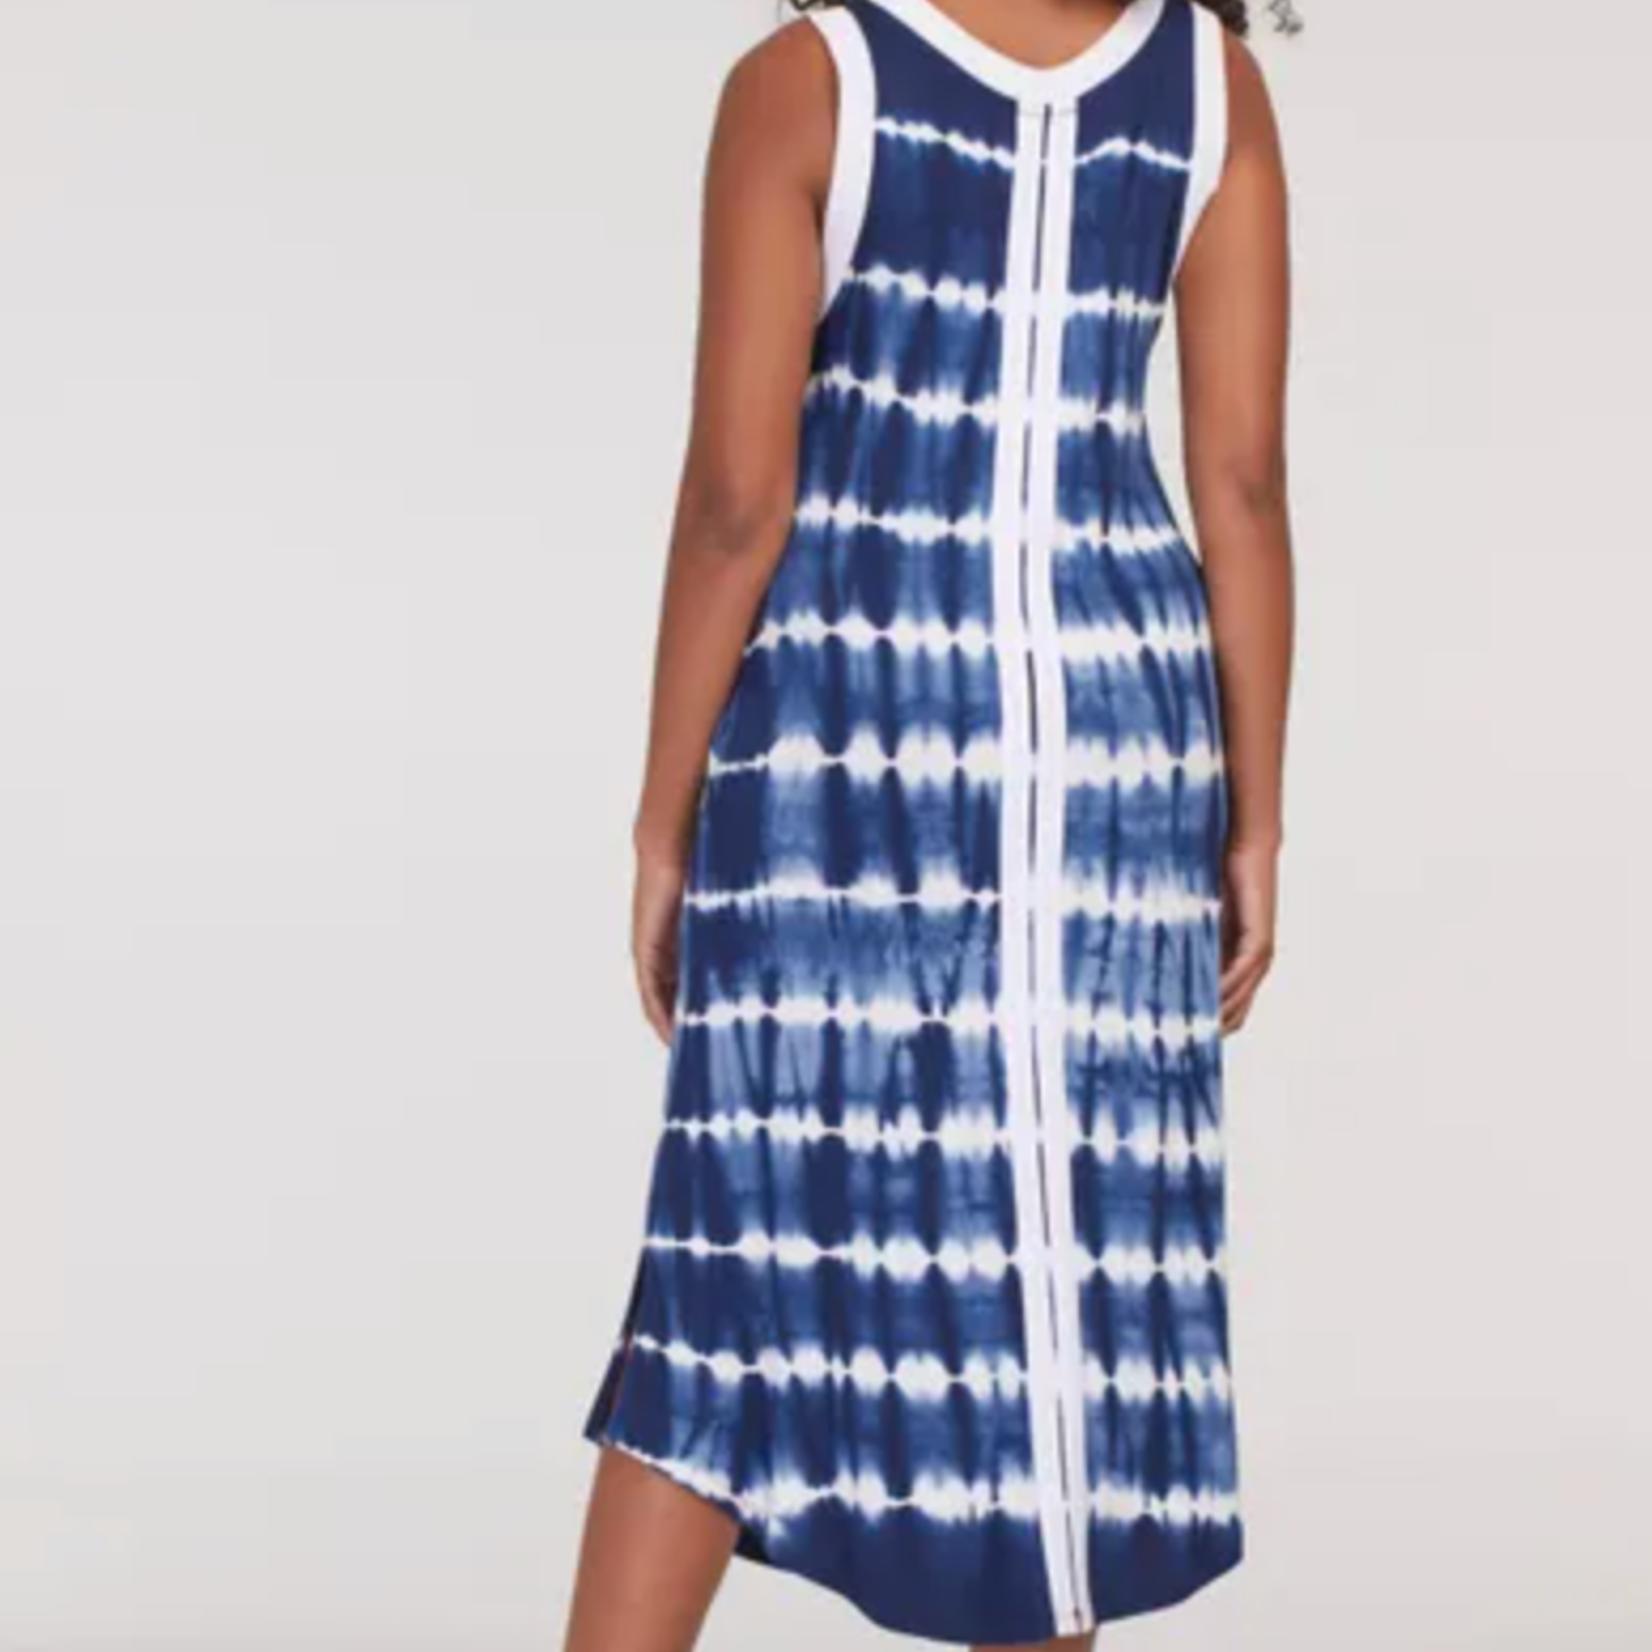 tribal Sleeveless Tie-Dye Jersey Dress 7980